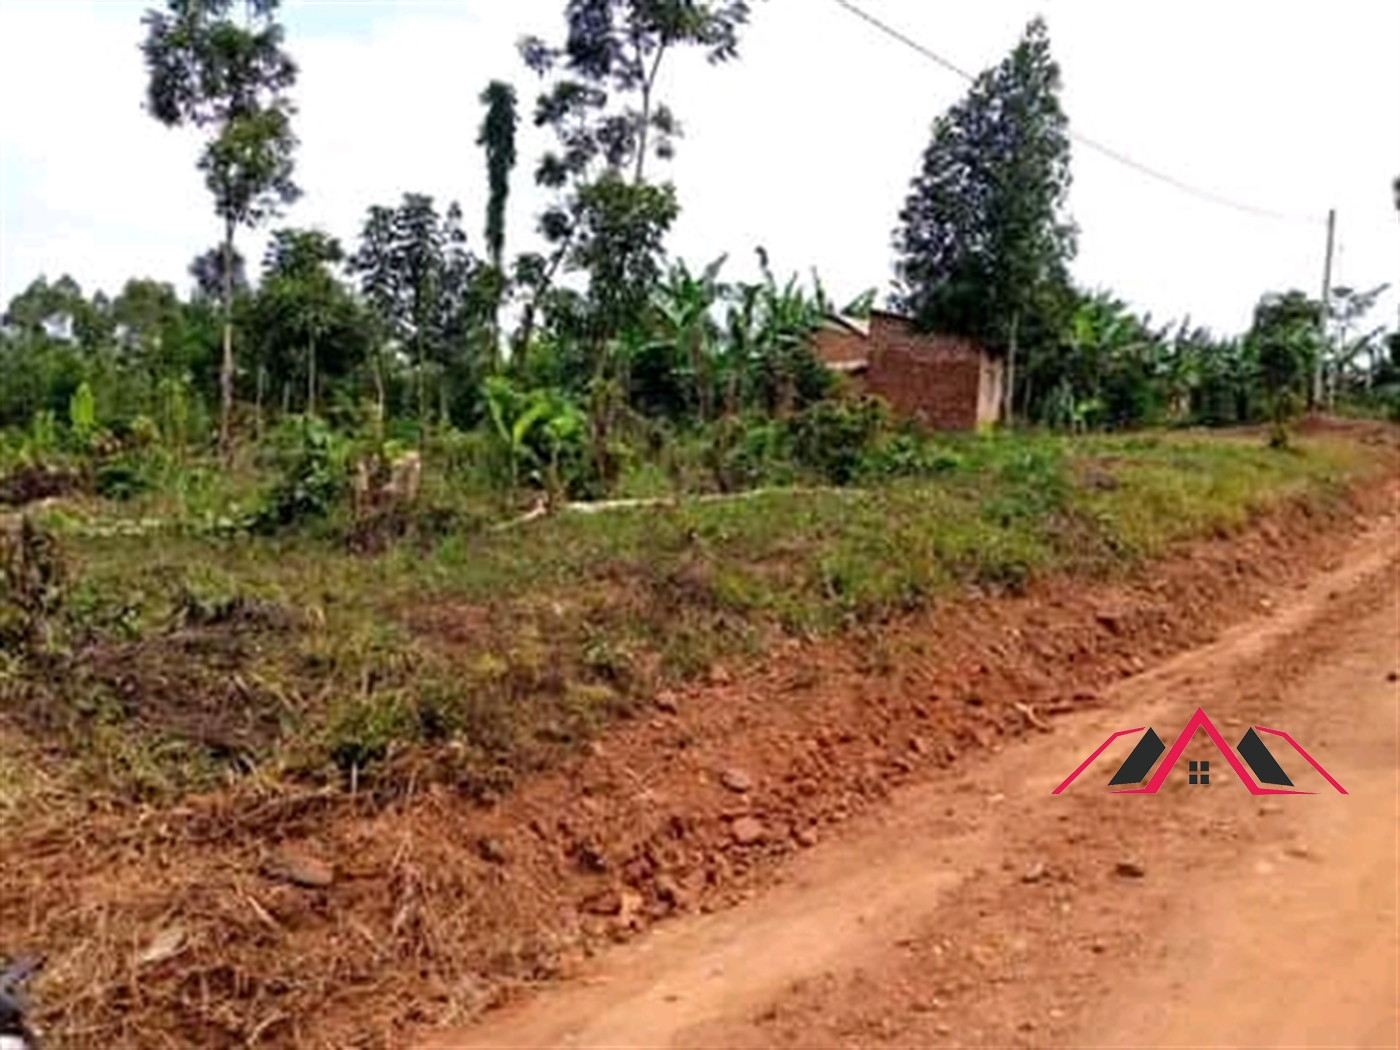 Residential Land for sale in Kayunga Mukono